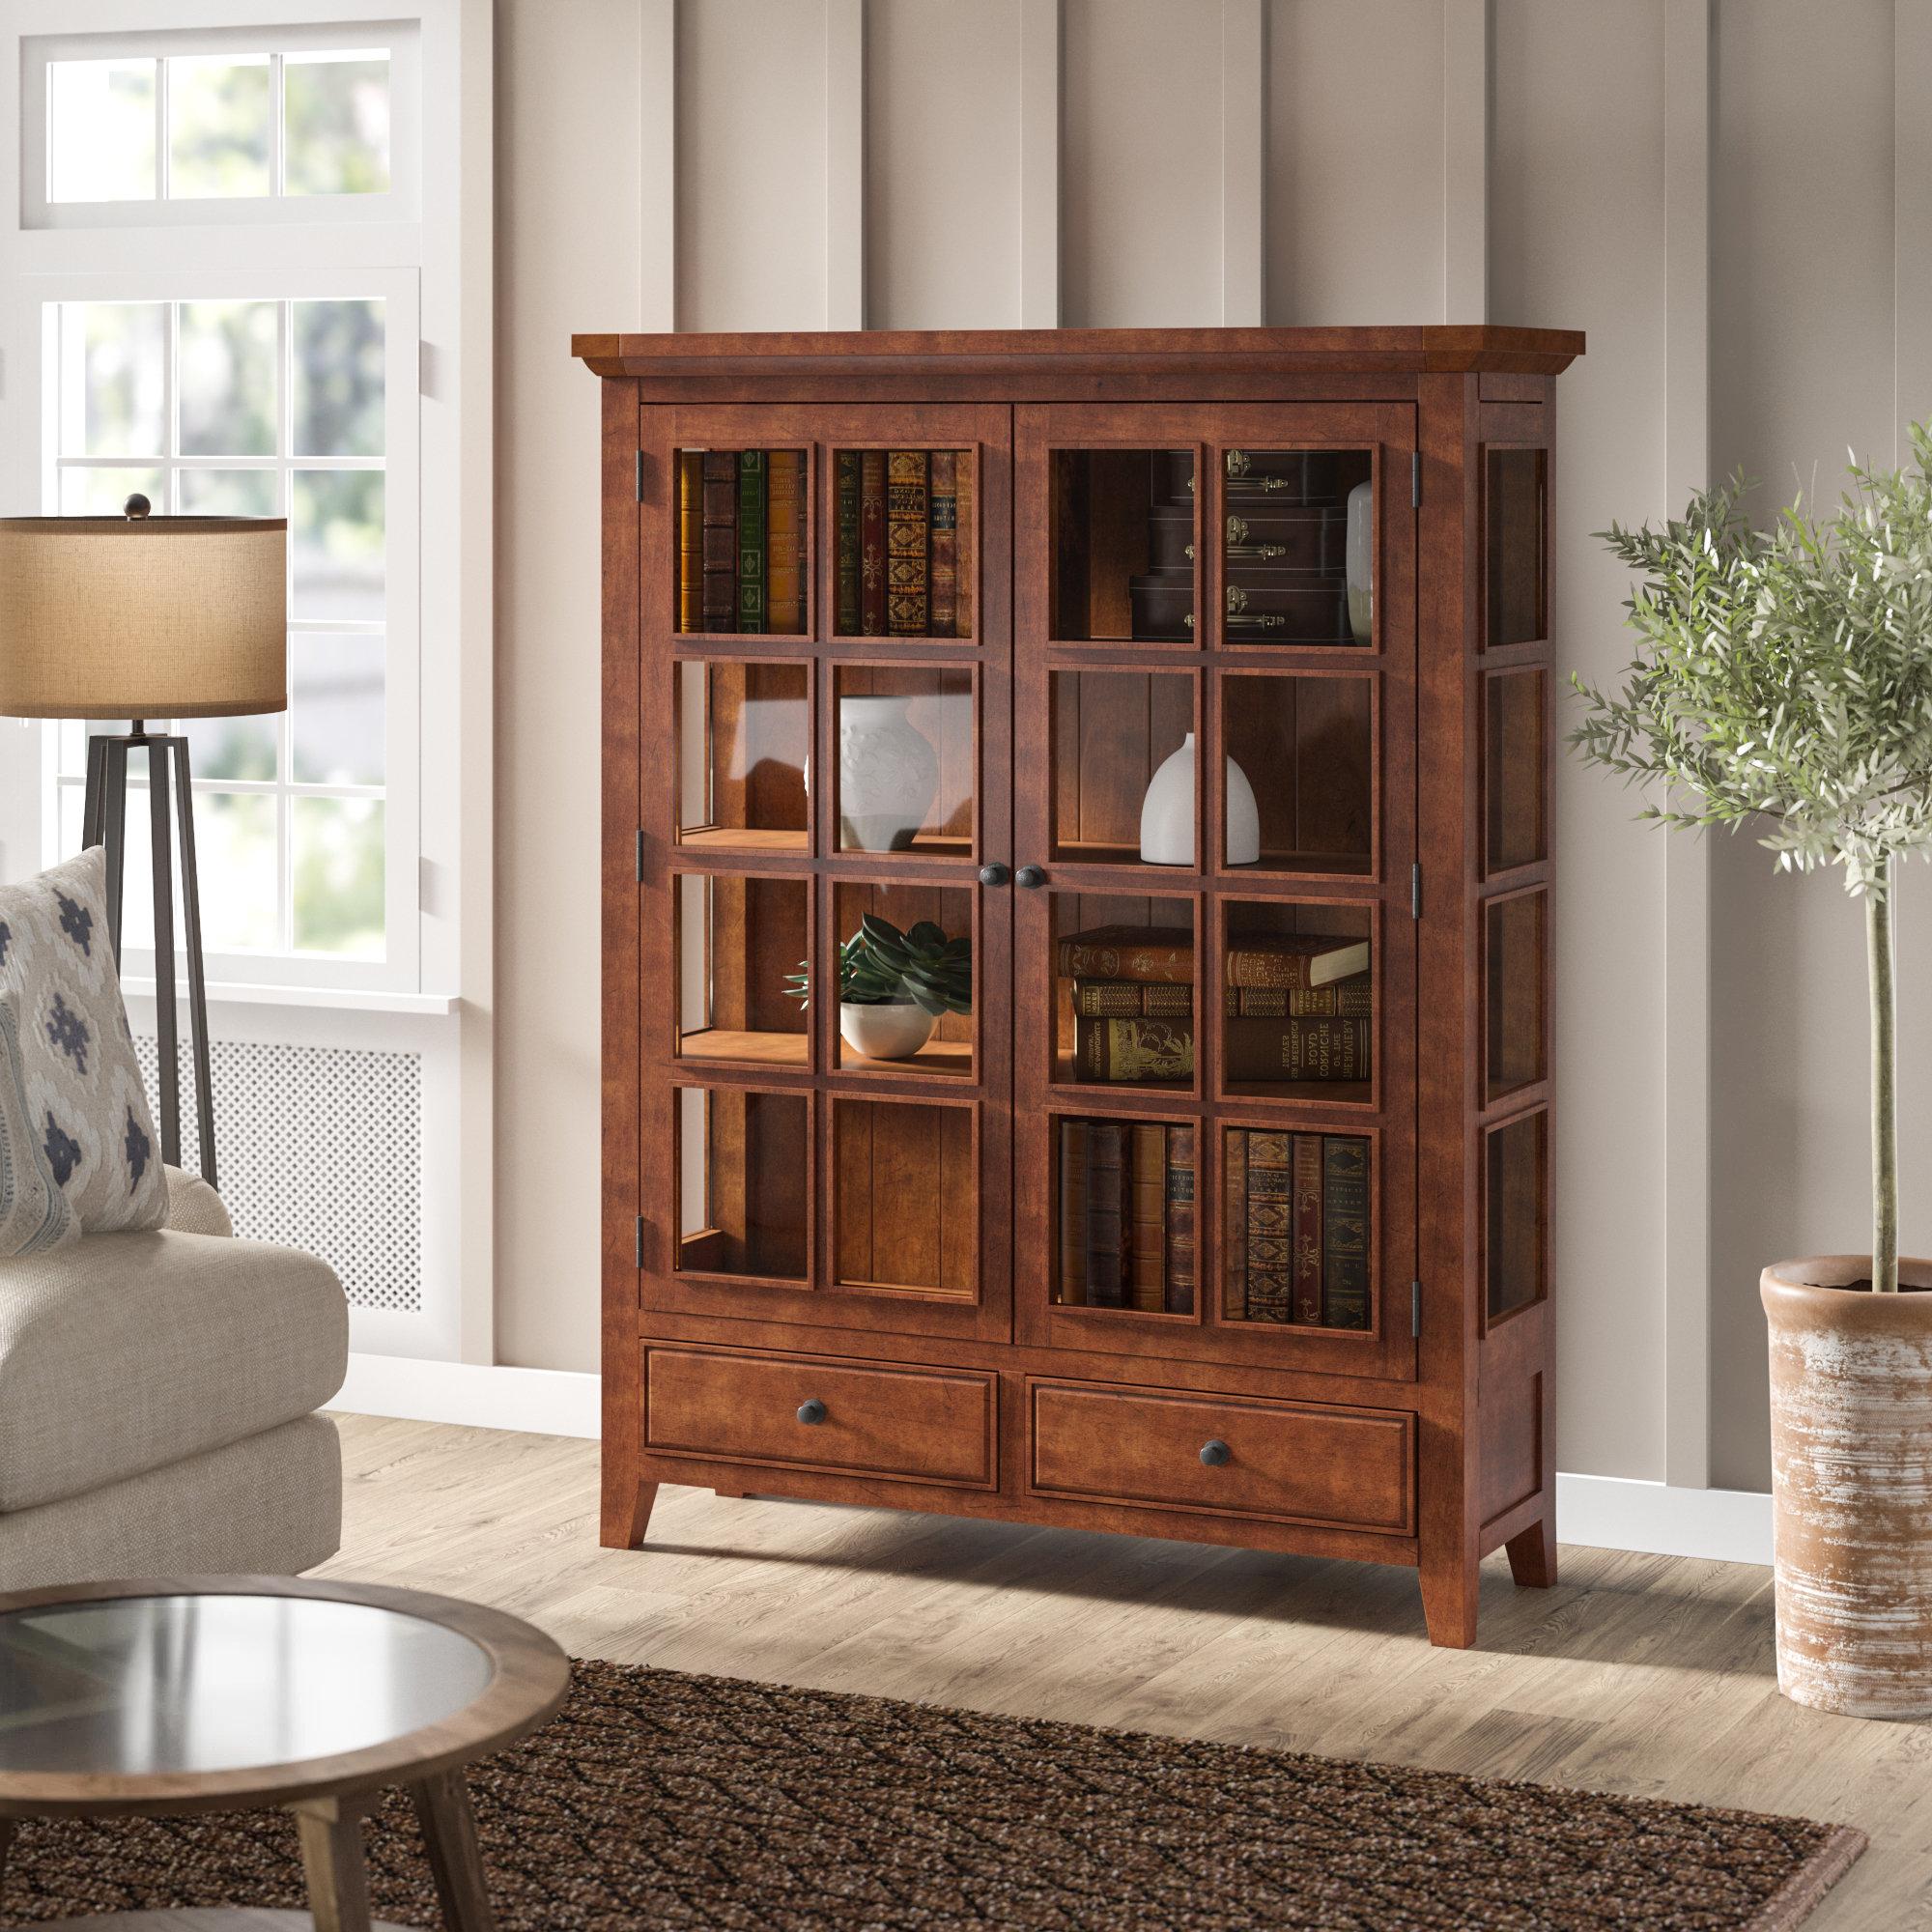 2019 Harris Standard Bookcase With Regard To Cerrato Standard Bookcases (View 15 of 20)